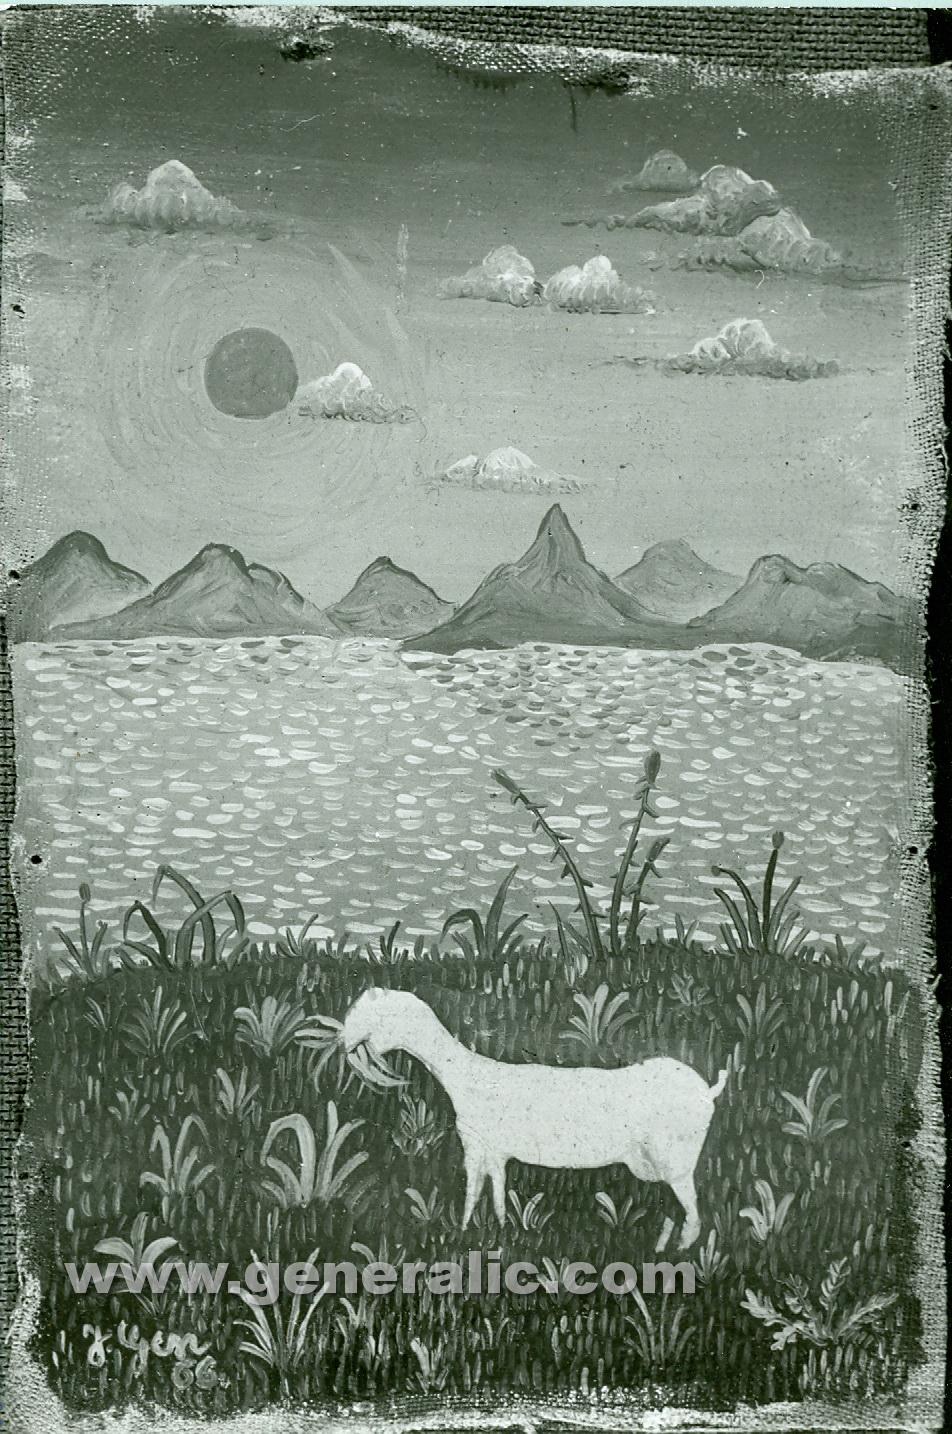 Josip Generalic, 1966, White goat, oil on canvas